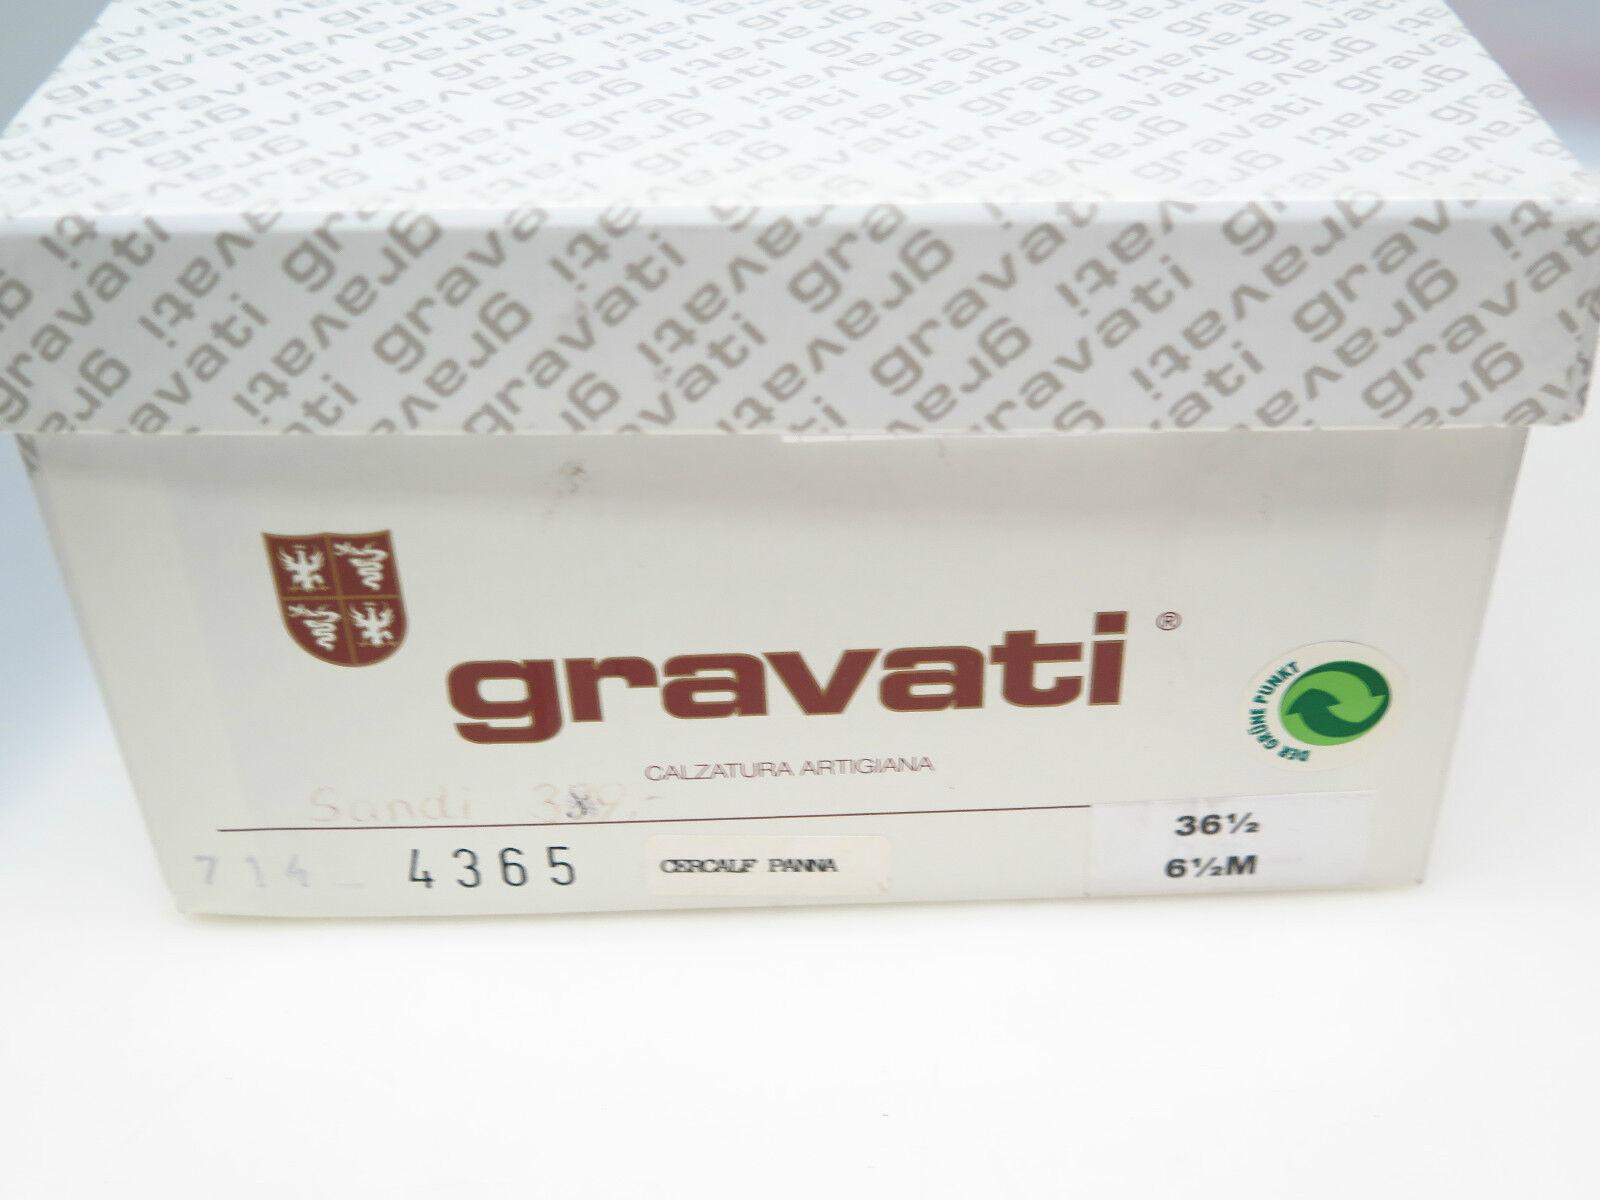 GRAVATI Cercalf Designer Damenschuhe Sandi 4365 Cercalf GRAVATI Panna UK 6,5 Gr. 36,5 NEU 4a141b